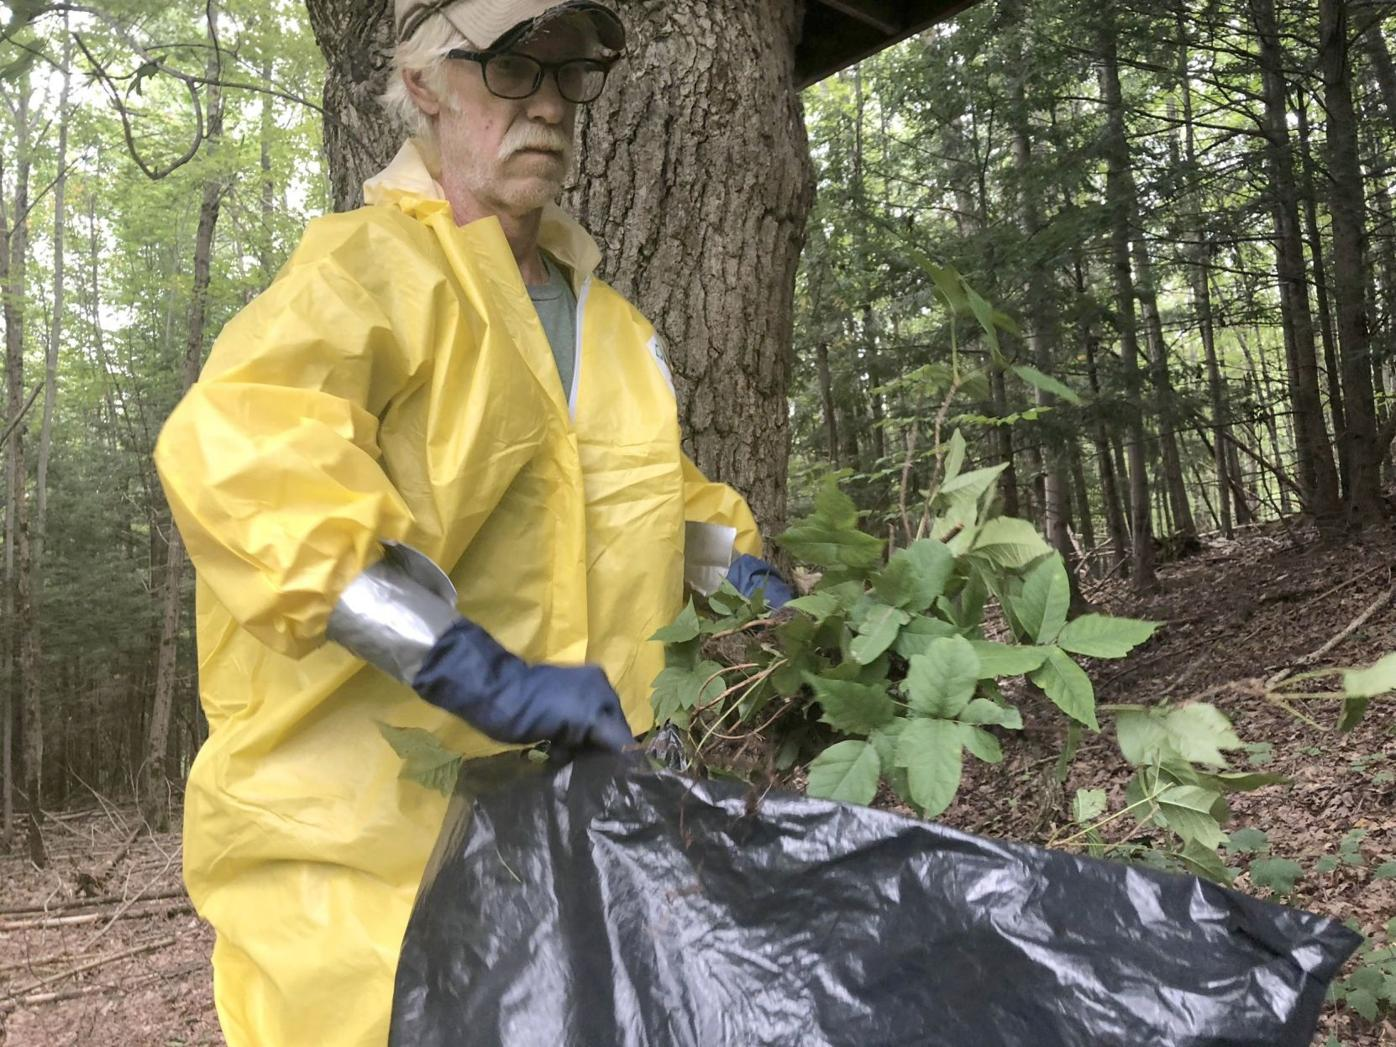 Leo Conley bags poison ivy